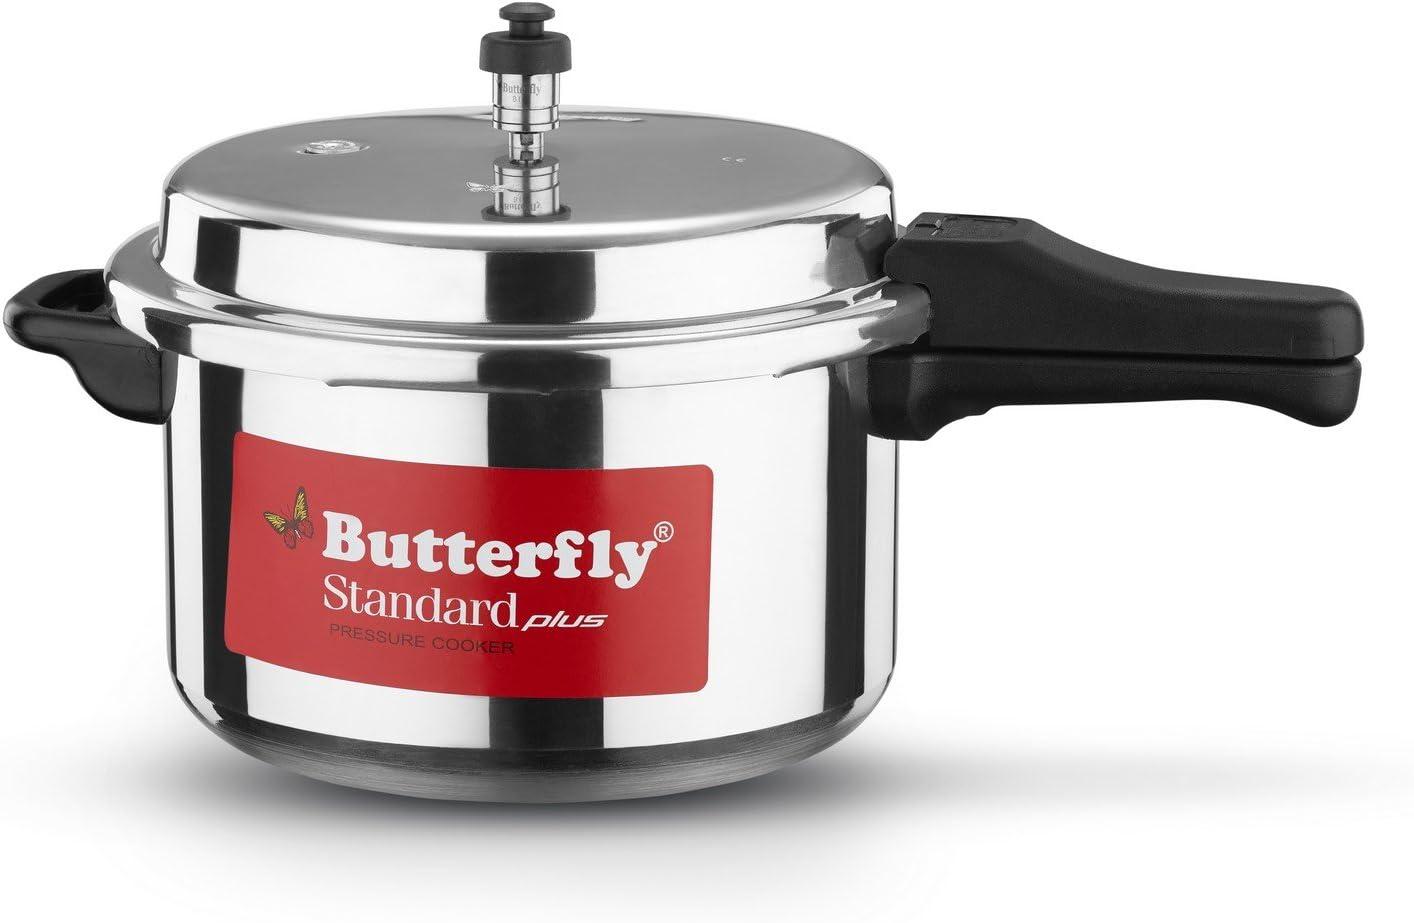 Butterfly SP-7.5L Standard Plus Aluminum Pressure Cooker, 7.5-Liter